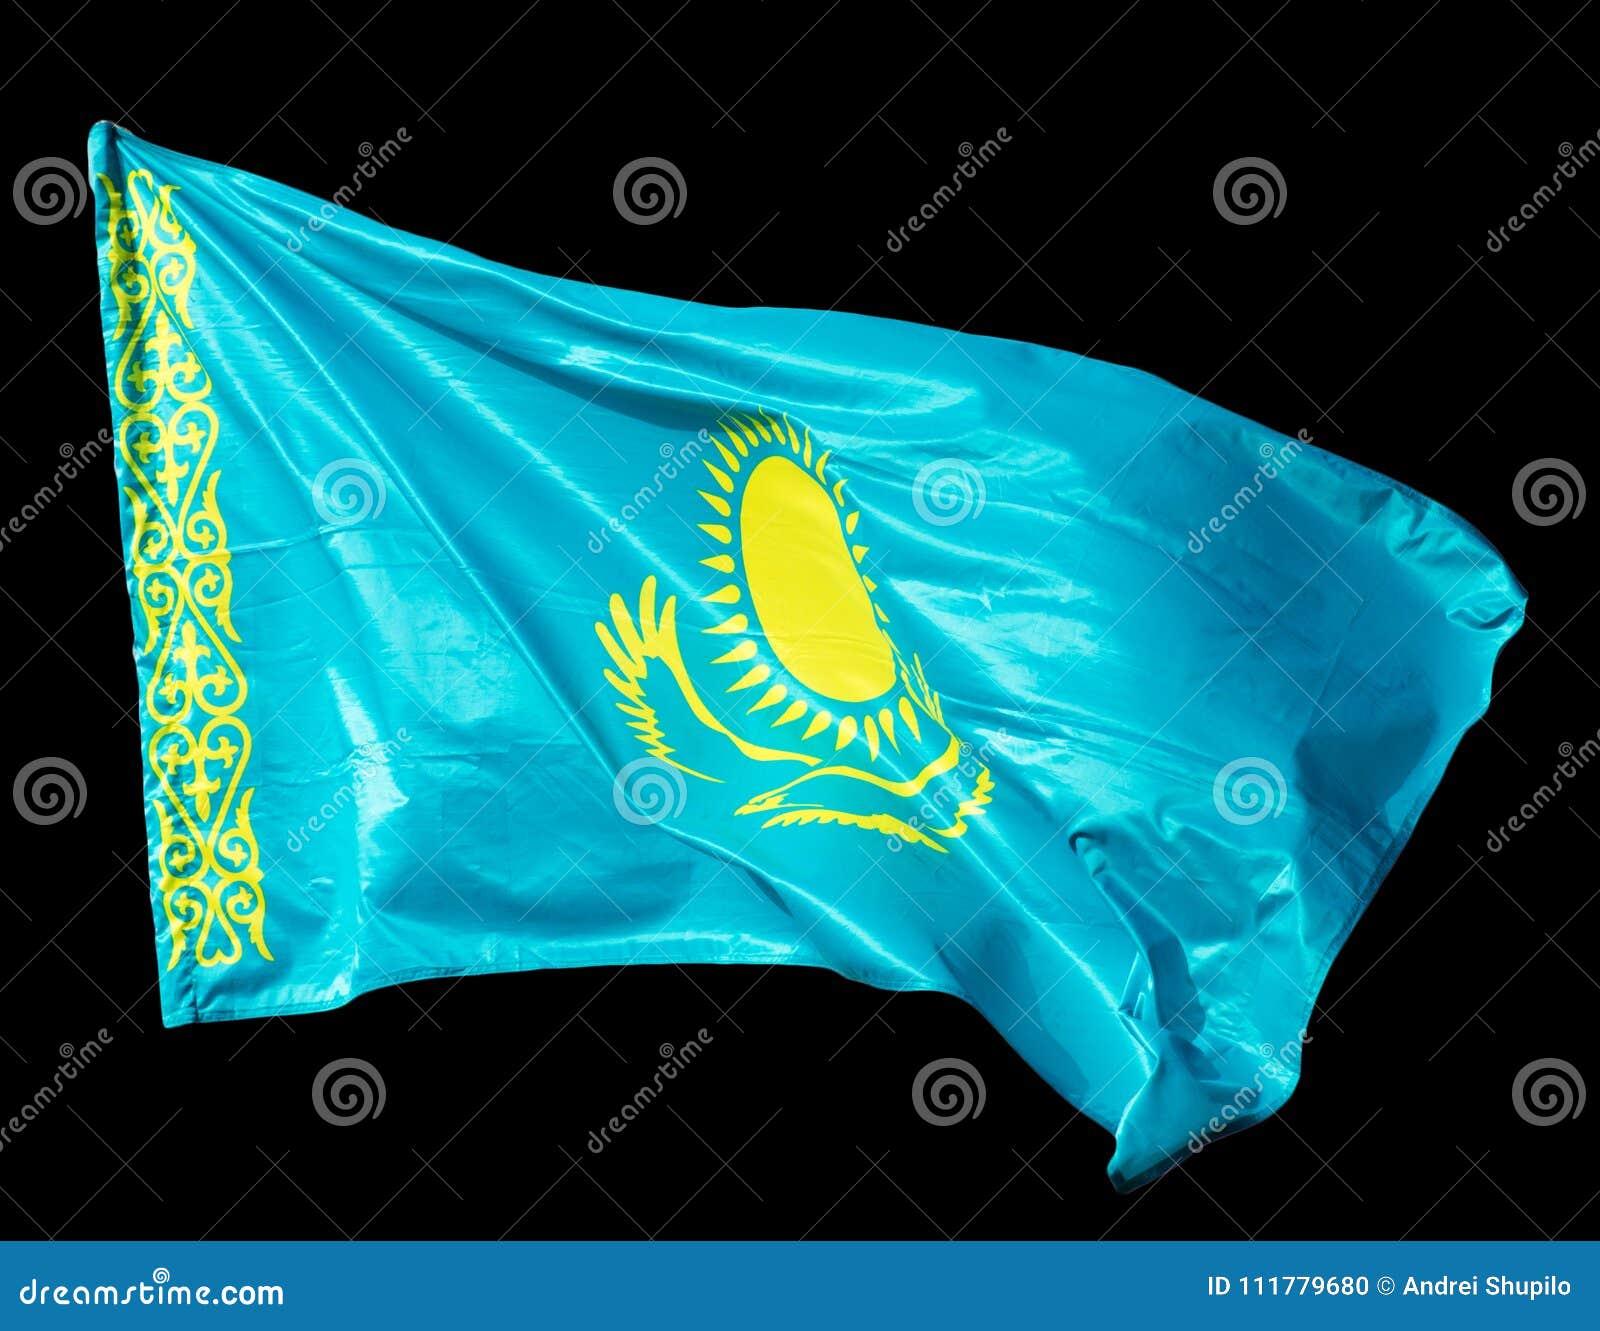 Kazakhstan flag on a black background